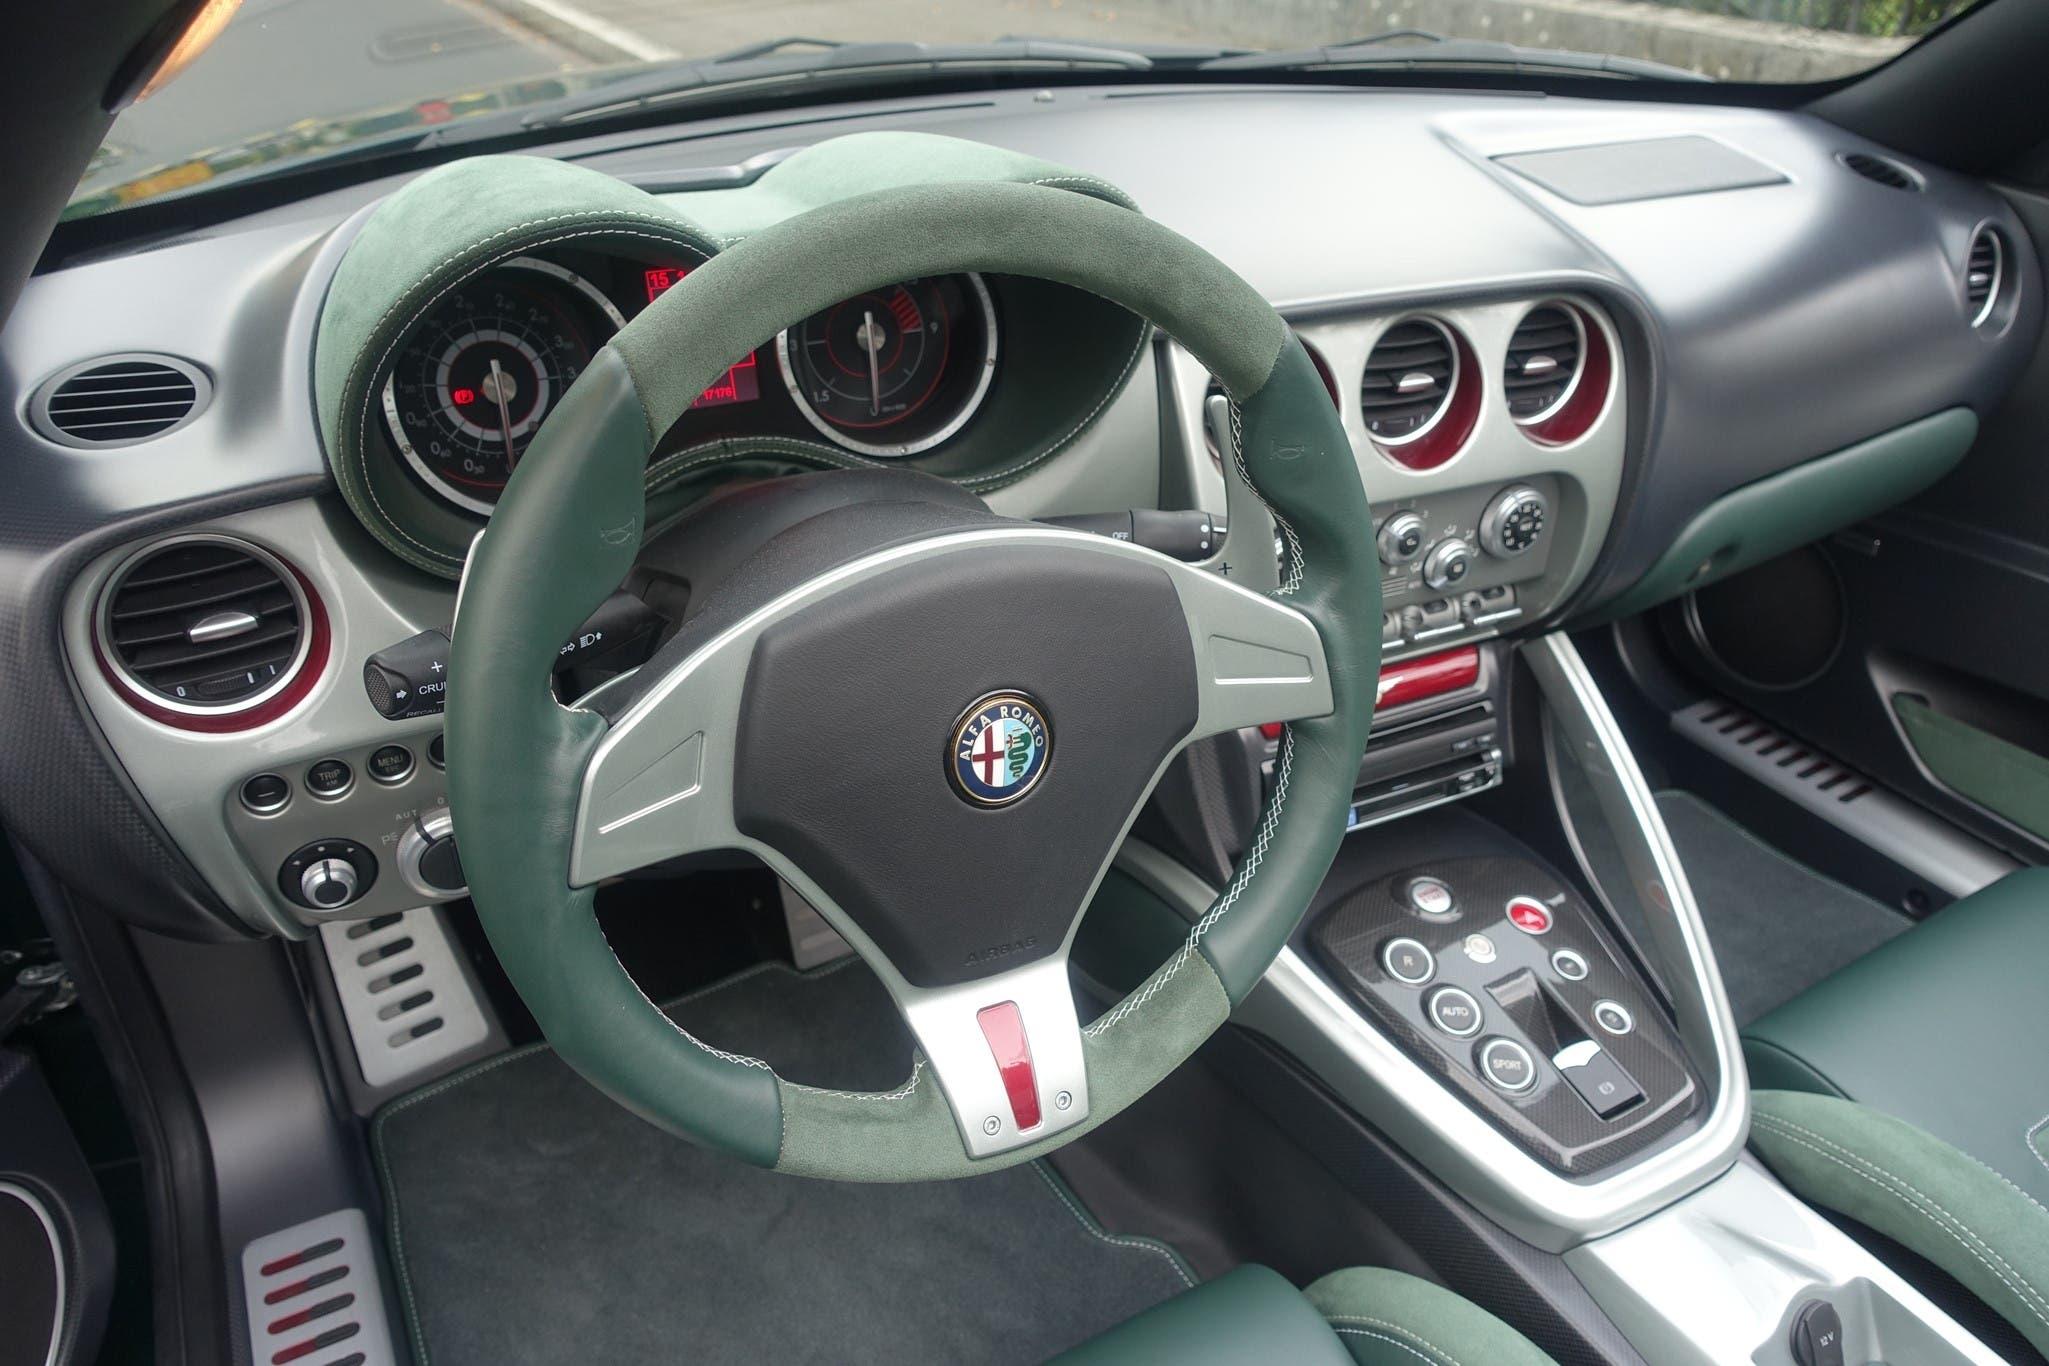 Alfa Romeo Disco Volante Spyder 2019 Svizzera